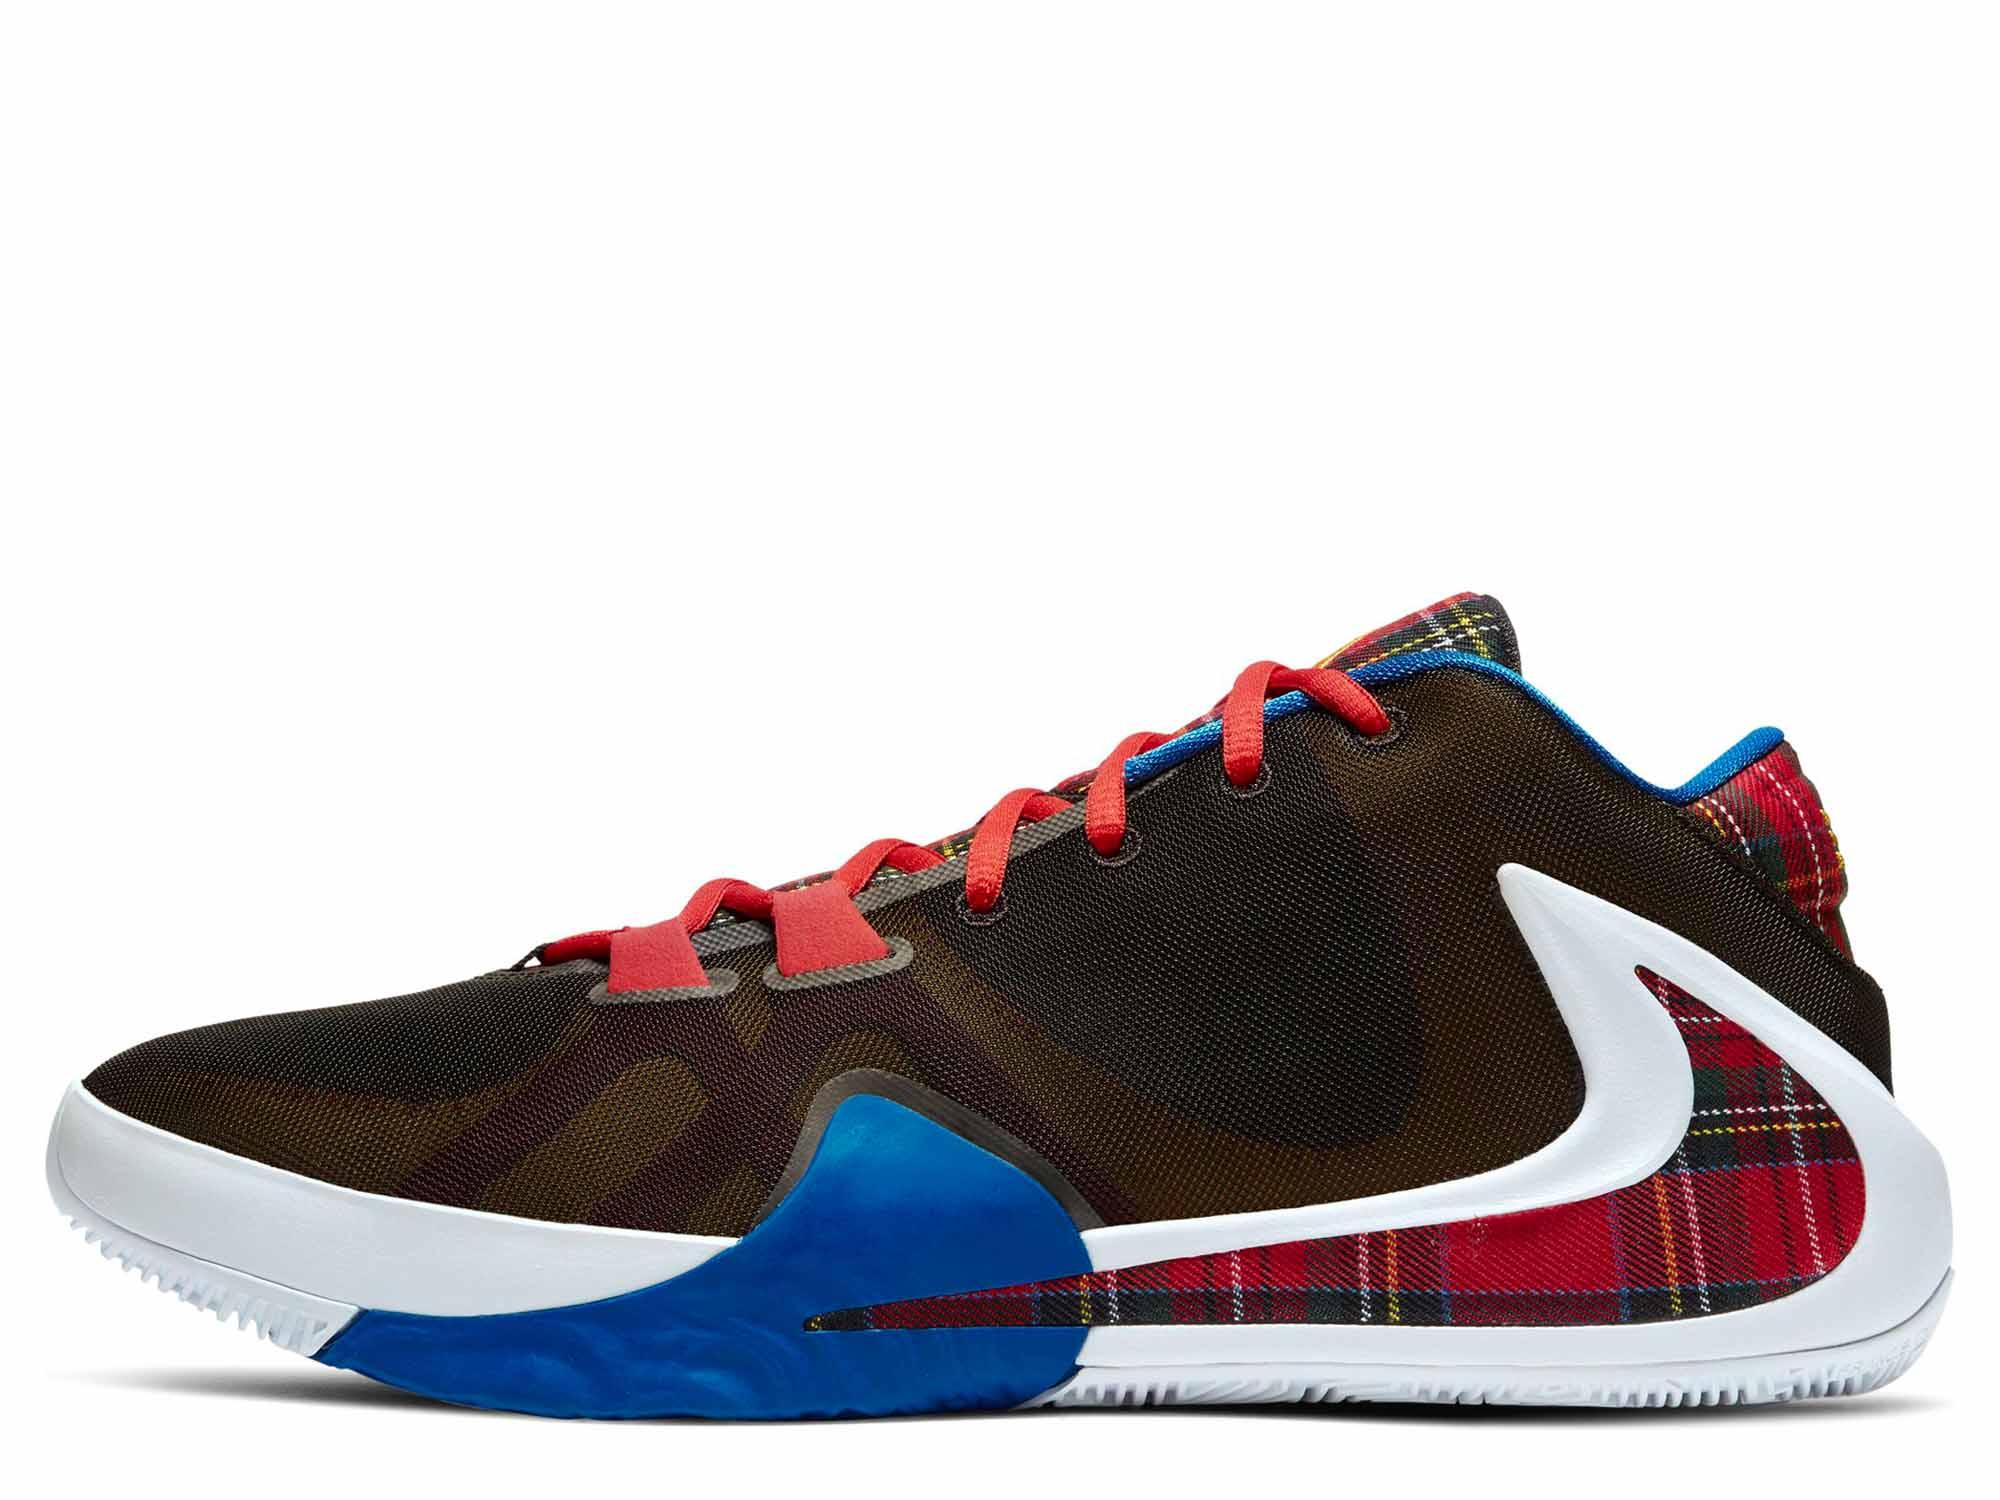 Nike Zoom Freak 1 Basketball Schuh - Giannis Antetekoumpo